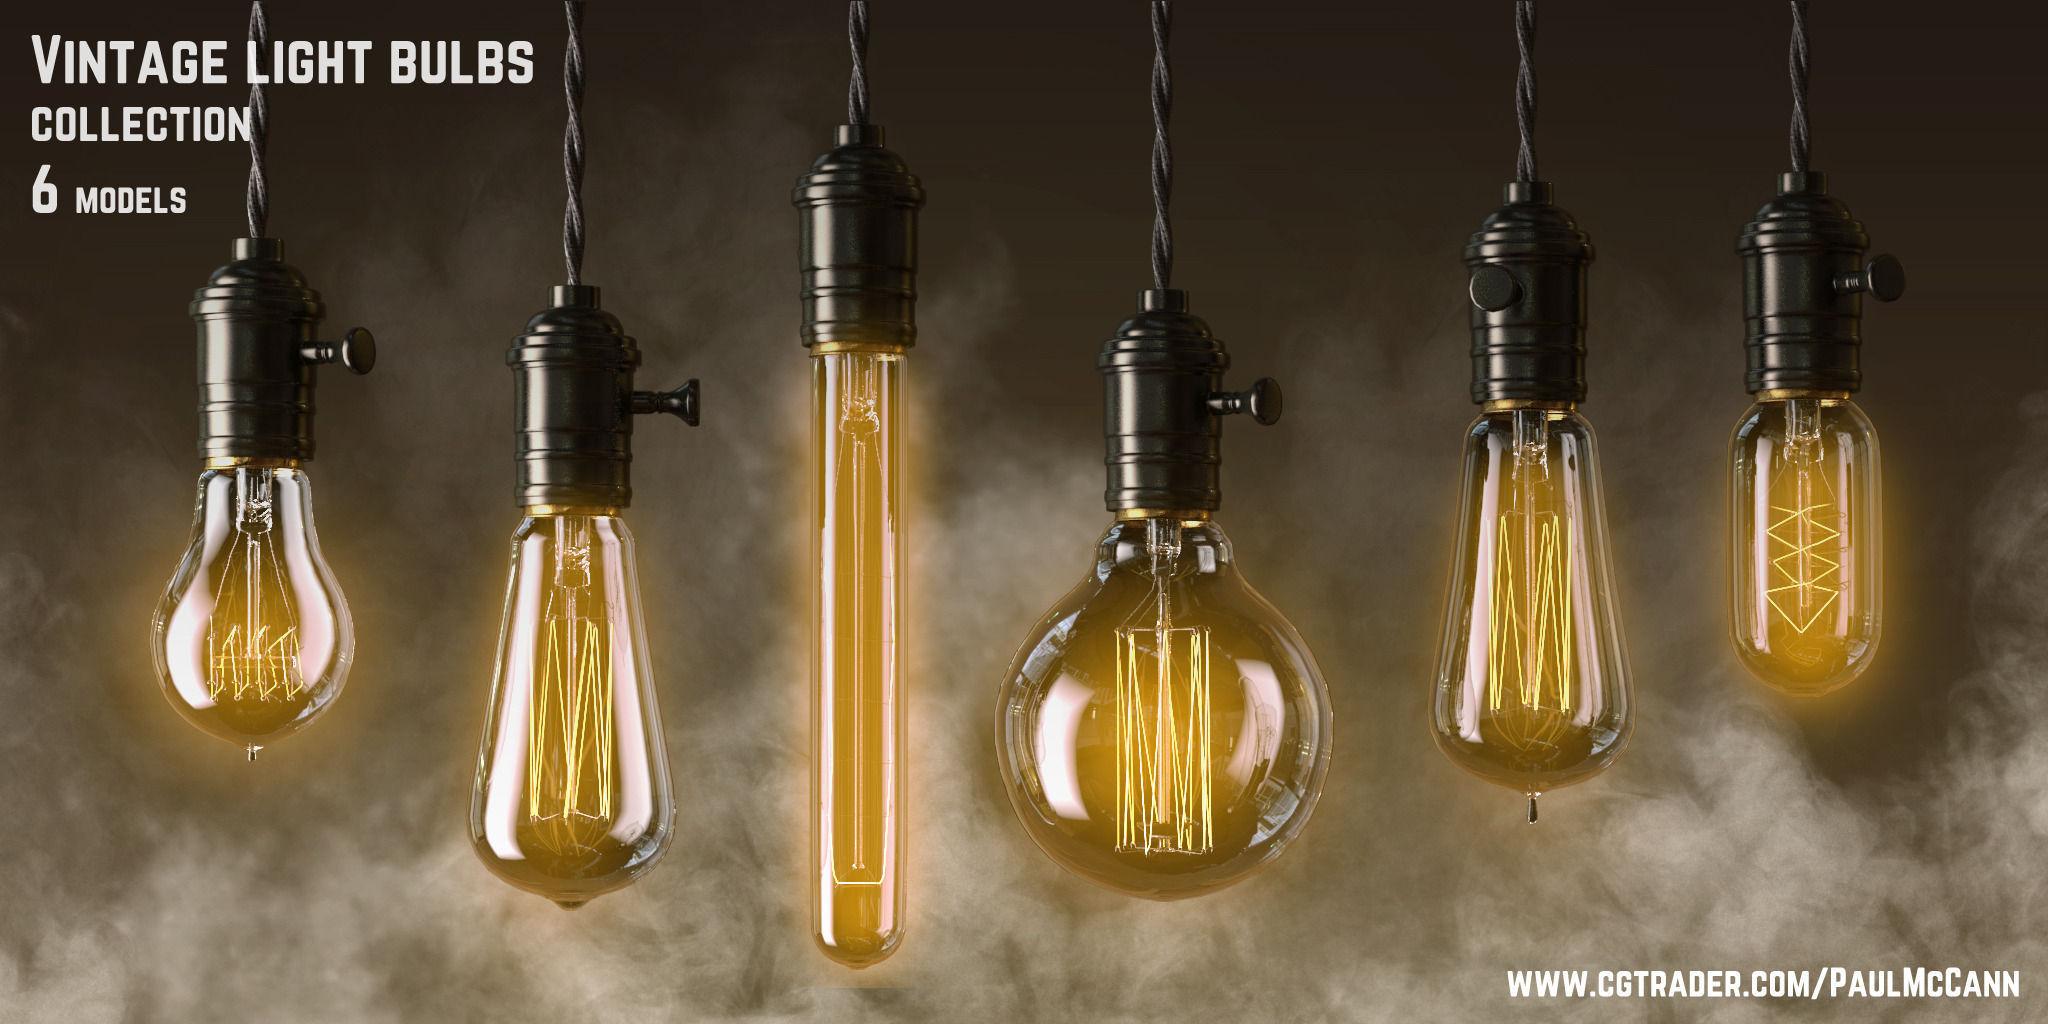 vintage edisson light bulbs collection 3d model max obj mtl 2